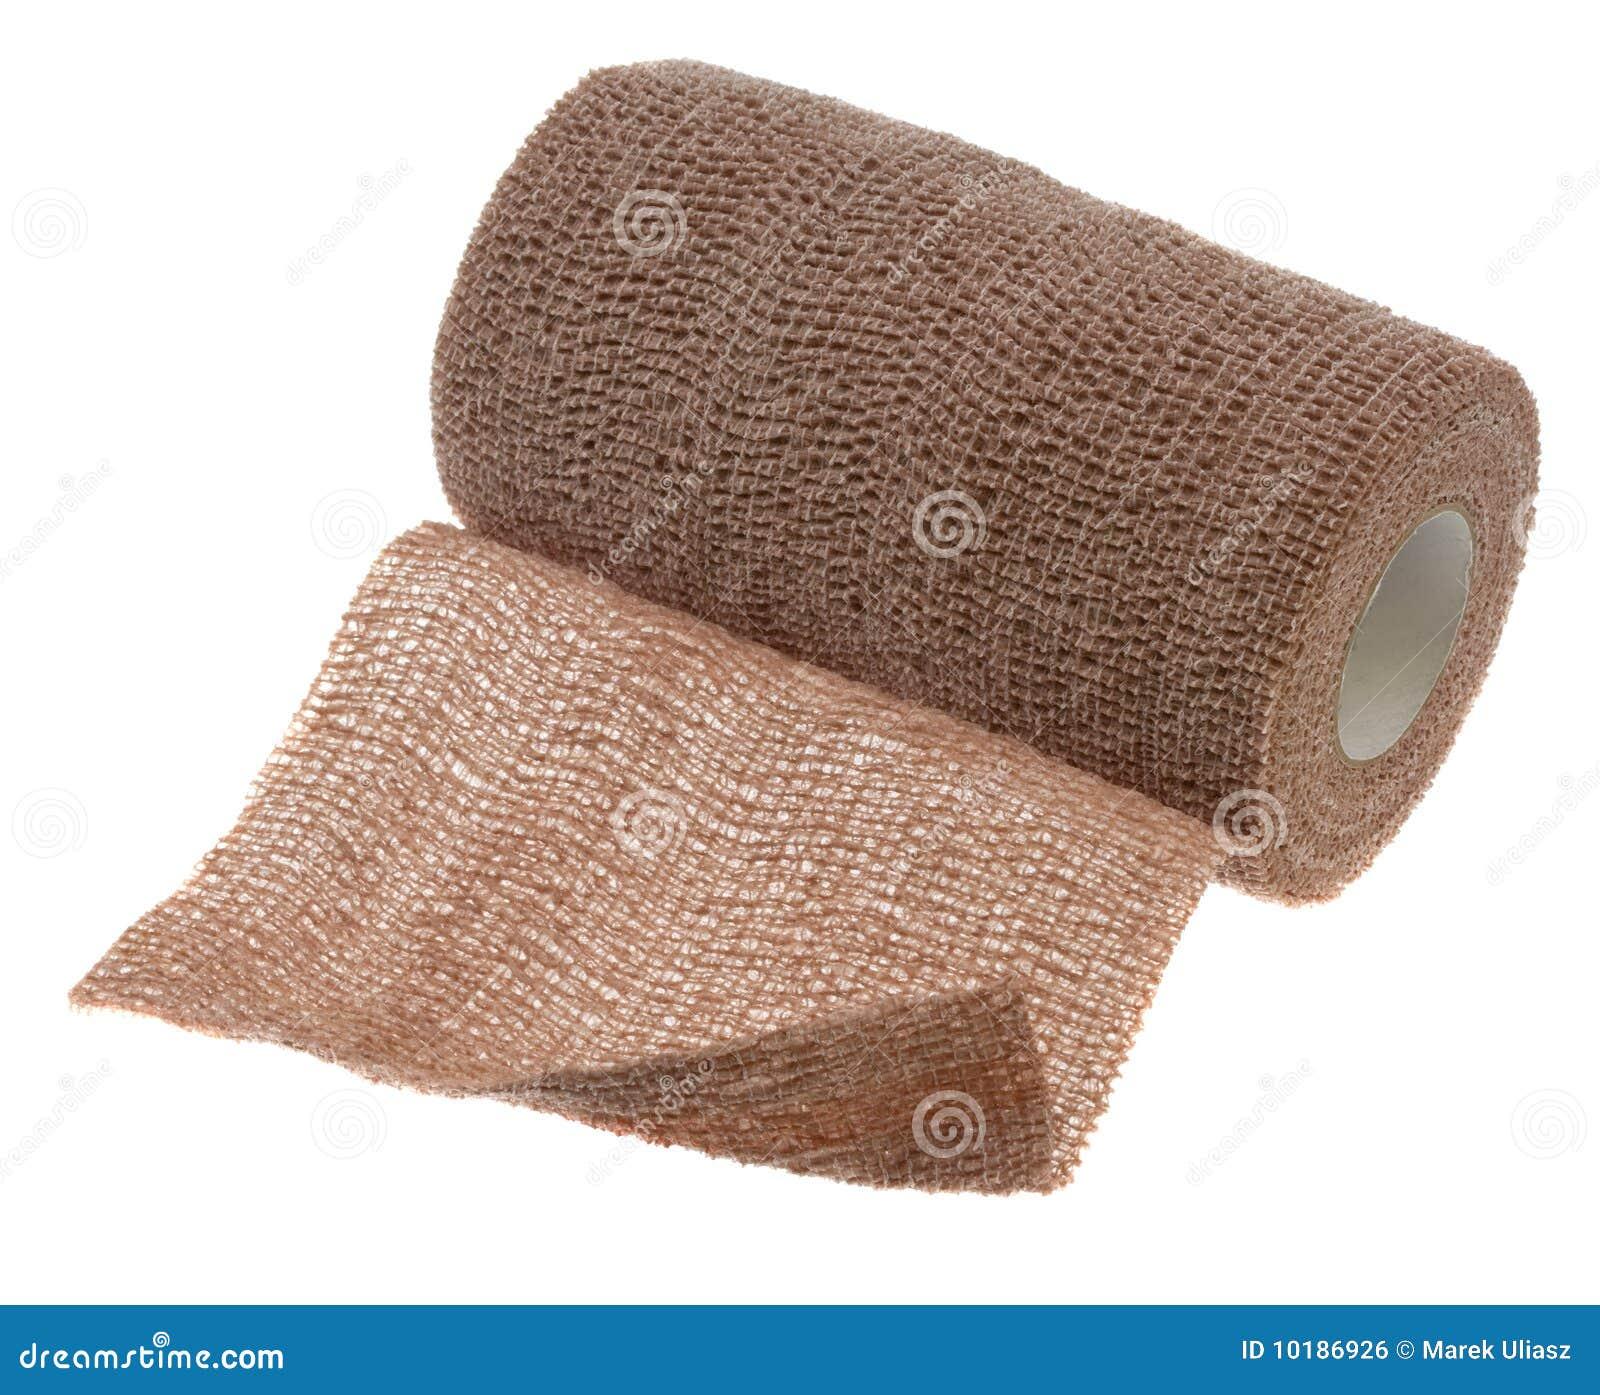 Bandaża opakunek spójny elastyczny